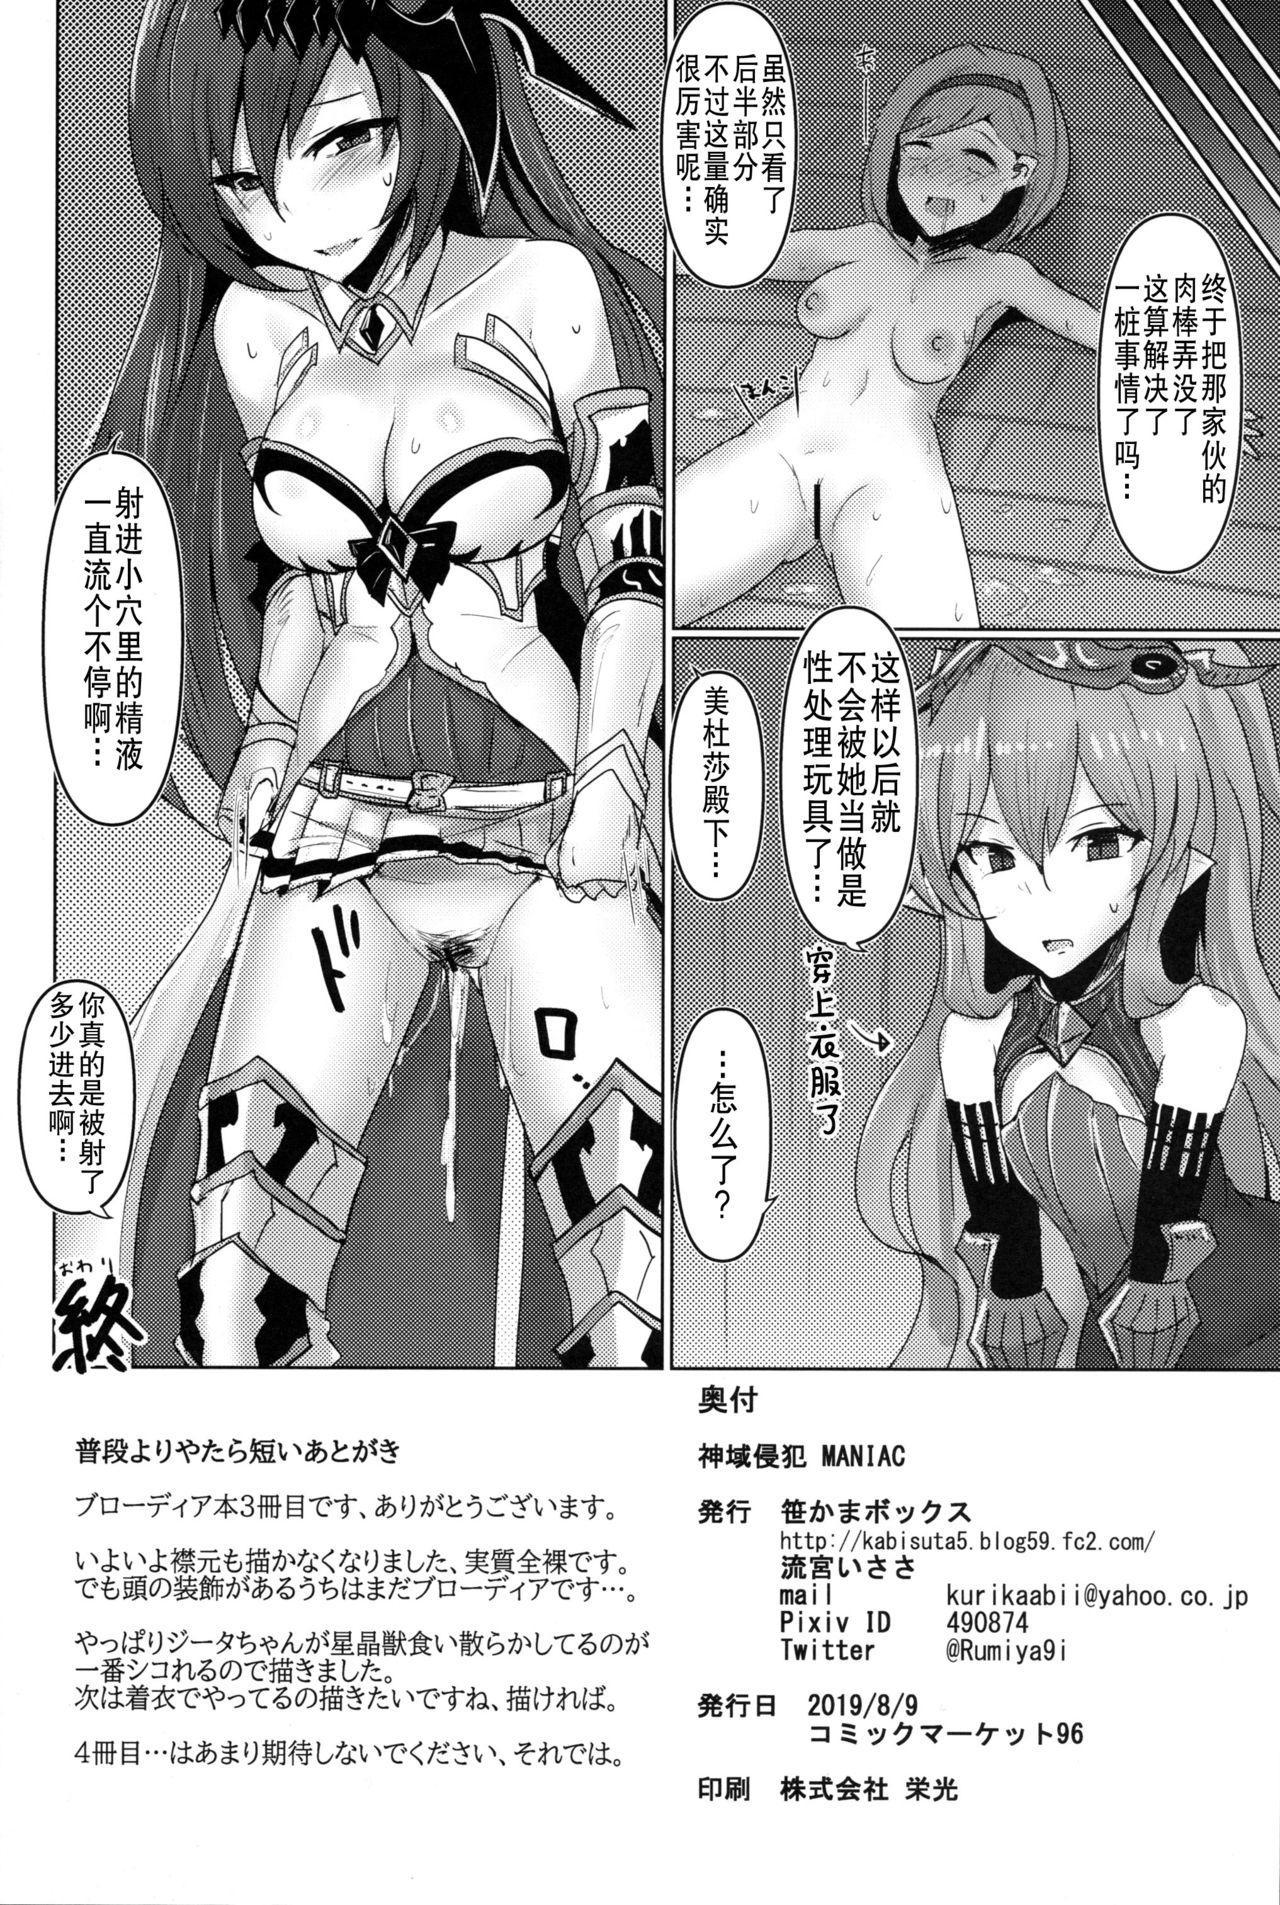 Shiniki Shinpan MANIAC   神域侵犯 MANIAC 17